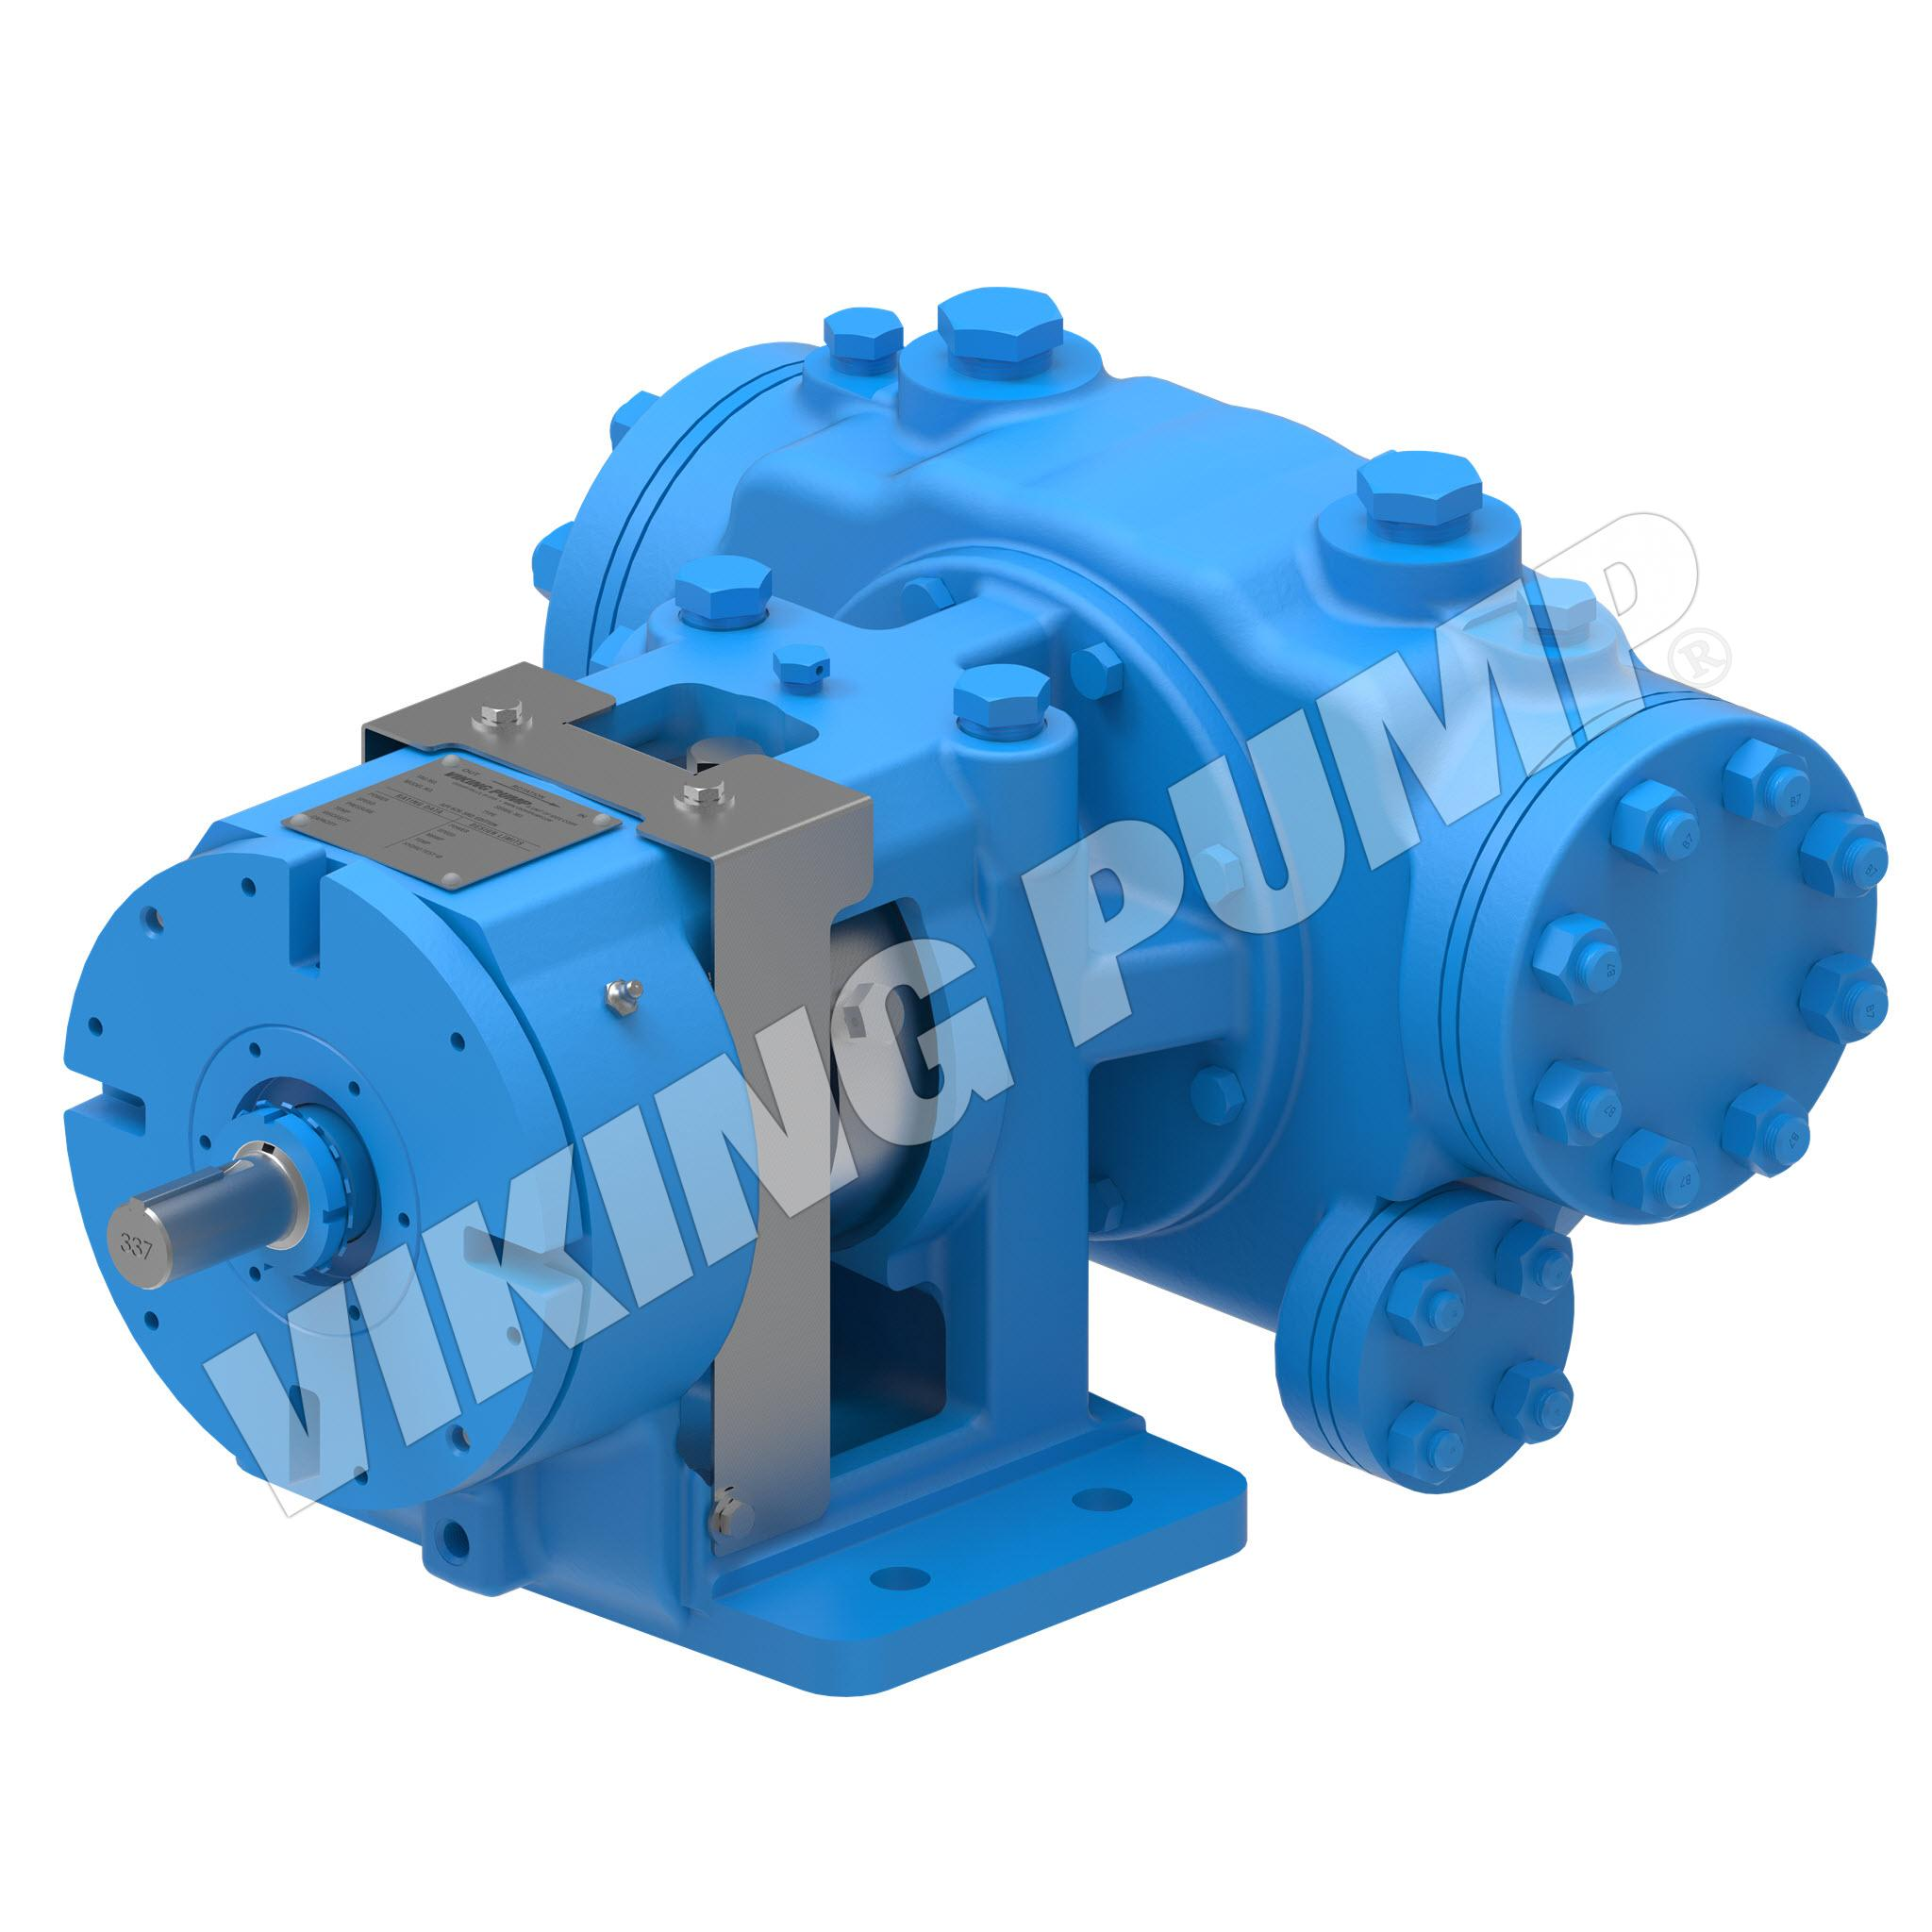 Model KK4223AX, Foot-Mounted, API 682 Seal, API 676-Compliant Pump